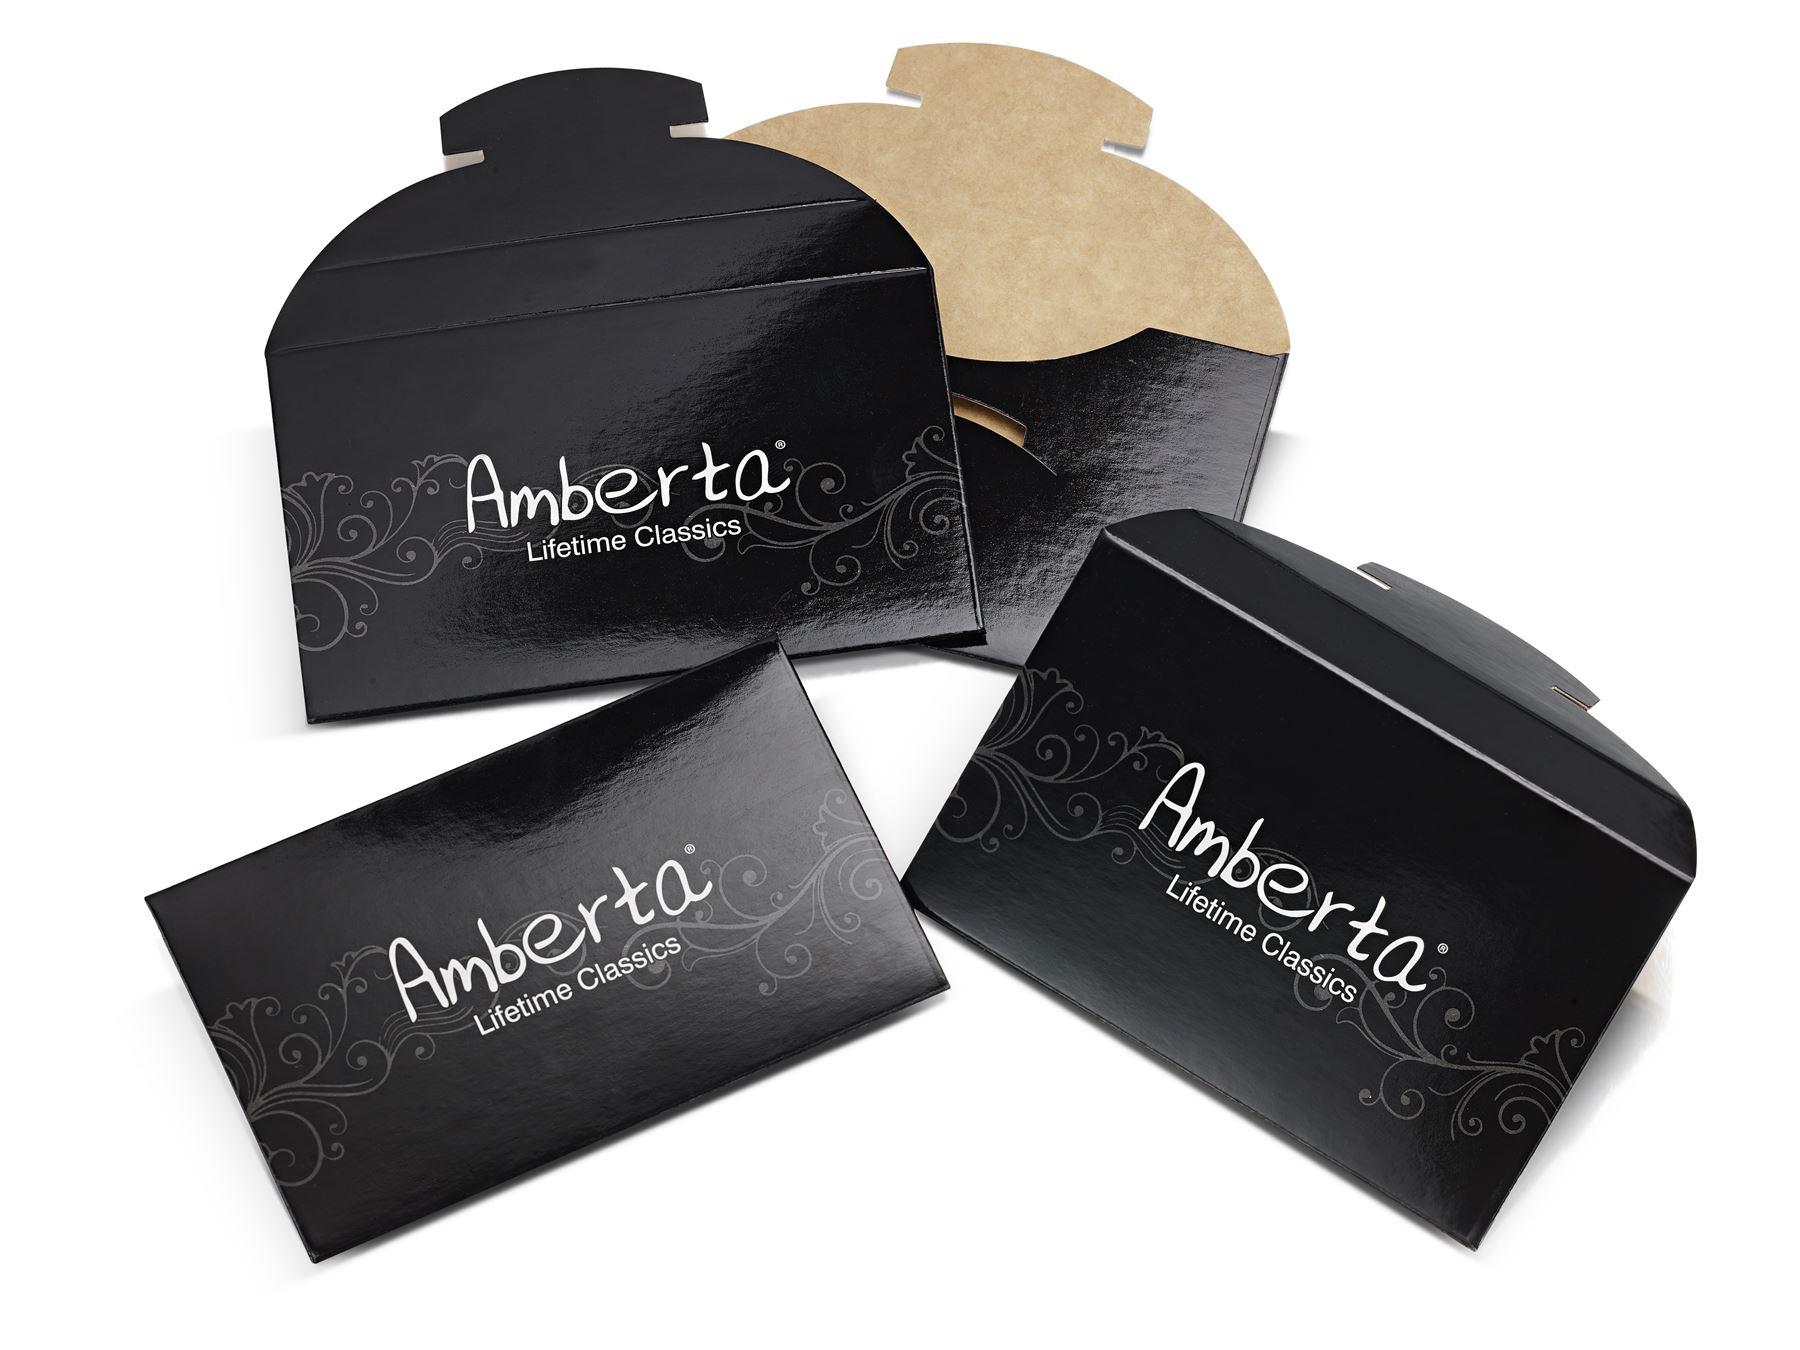 Amberta-Jewelry-925-Sterling-Silver-Adjustable-Bracelet-Italian-Bangle-for-Women miniature 61